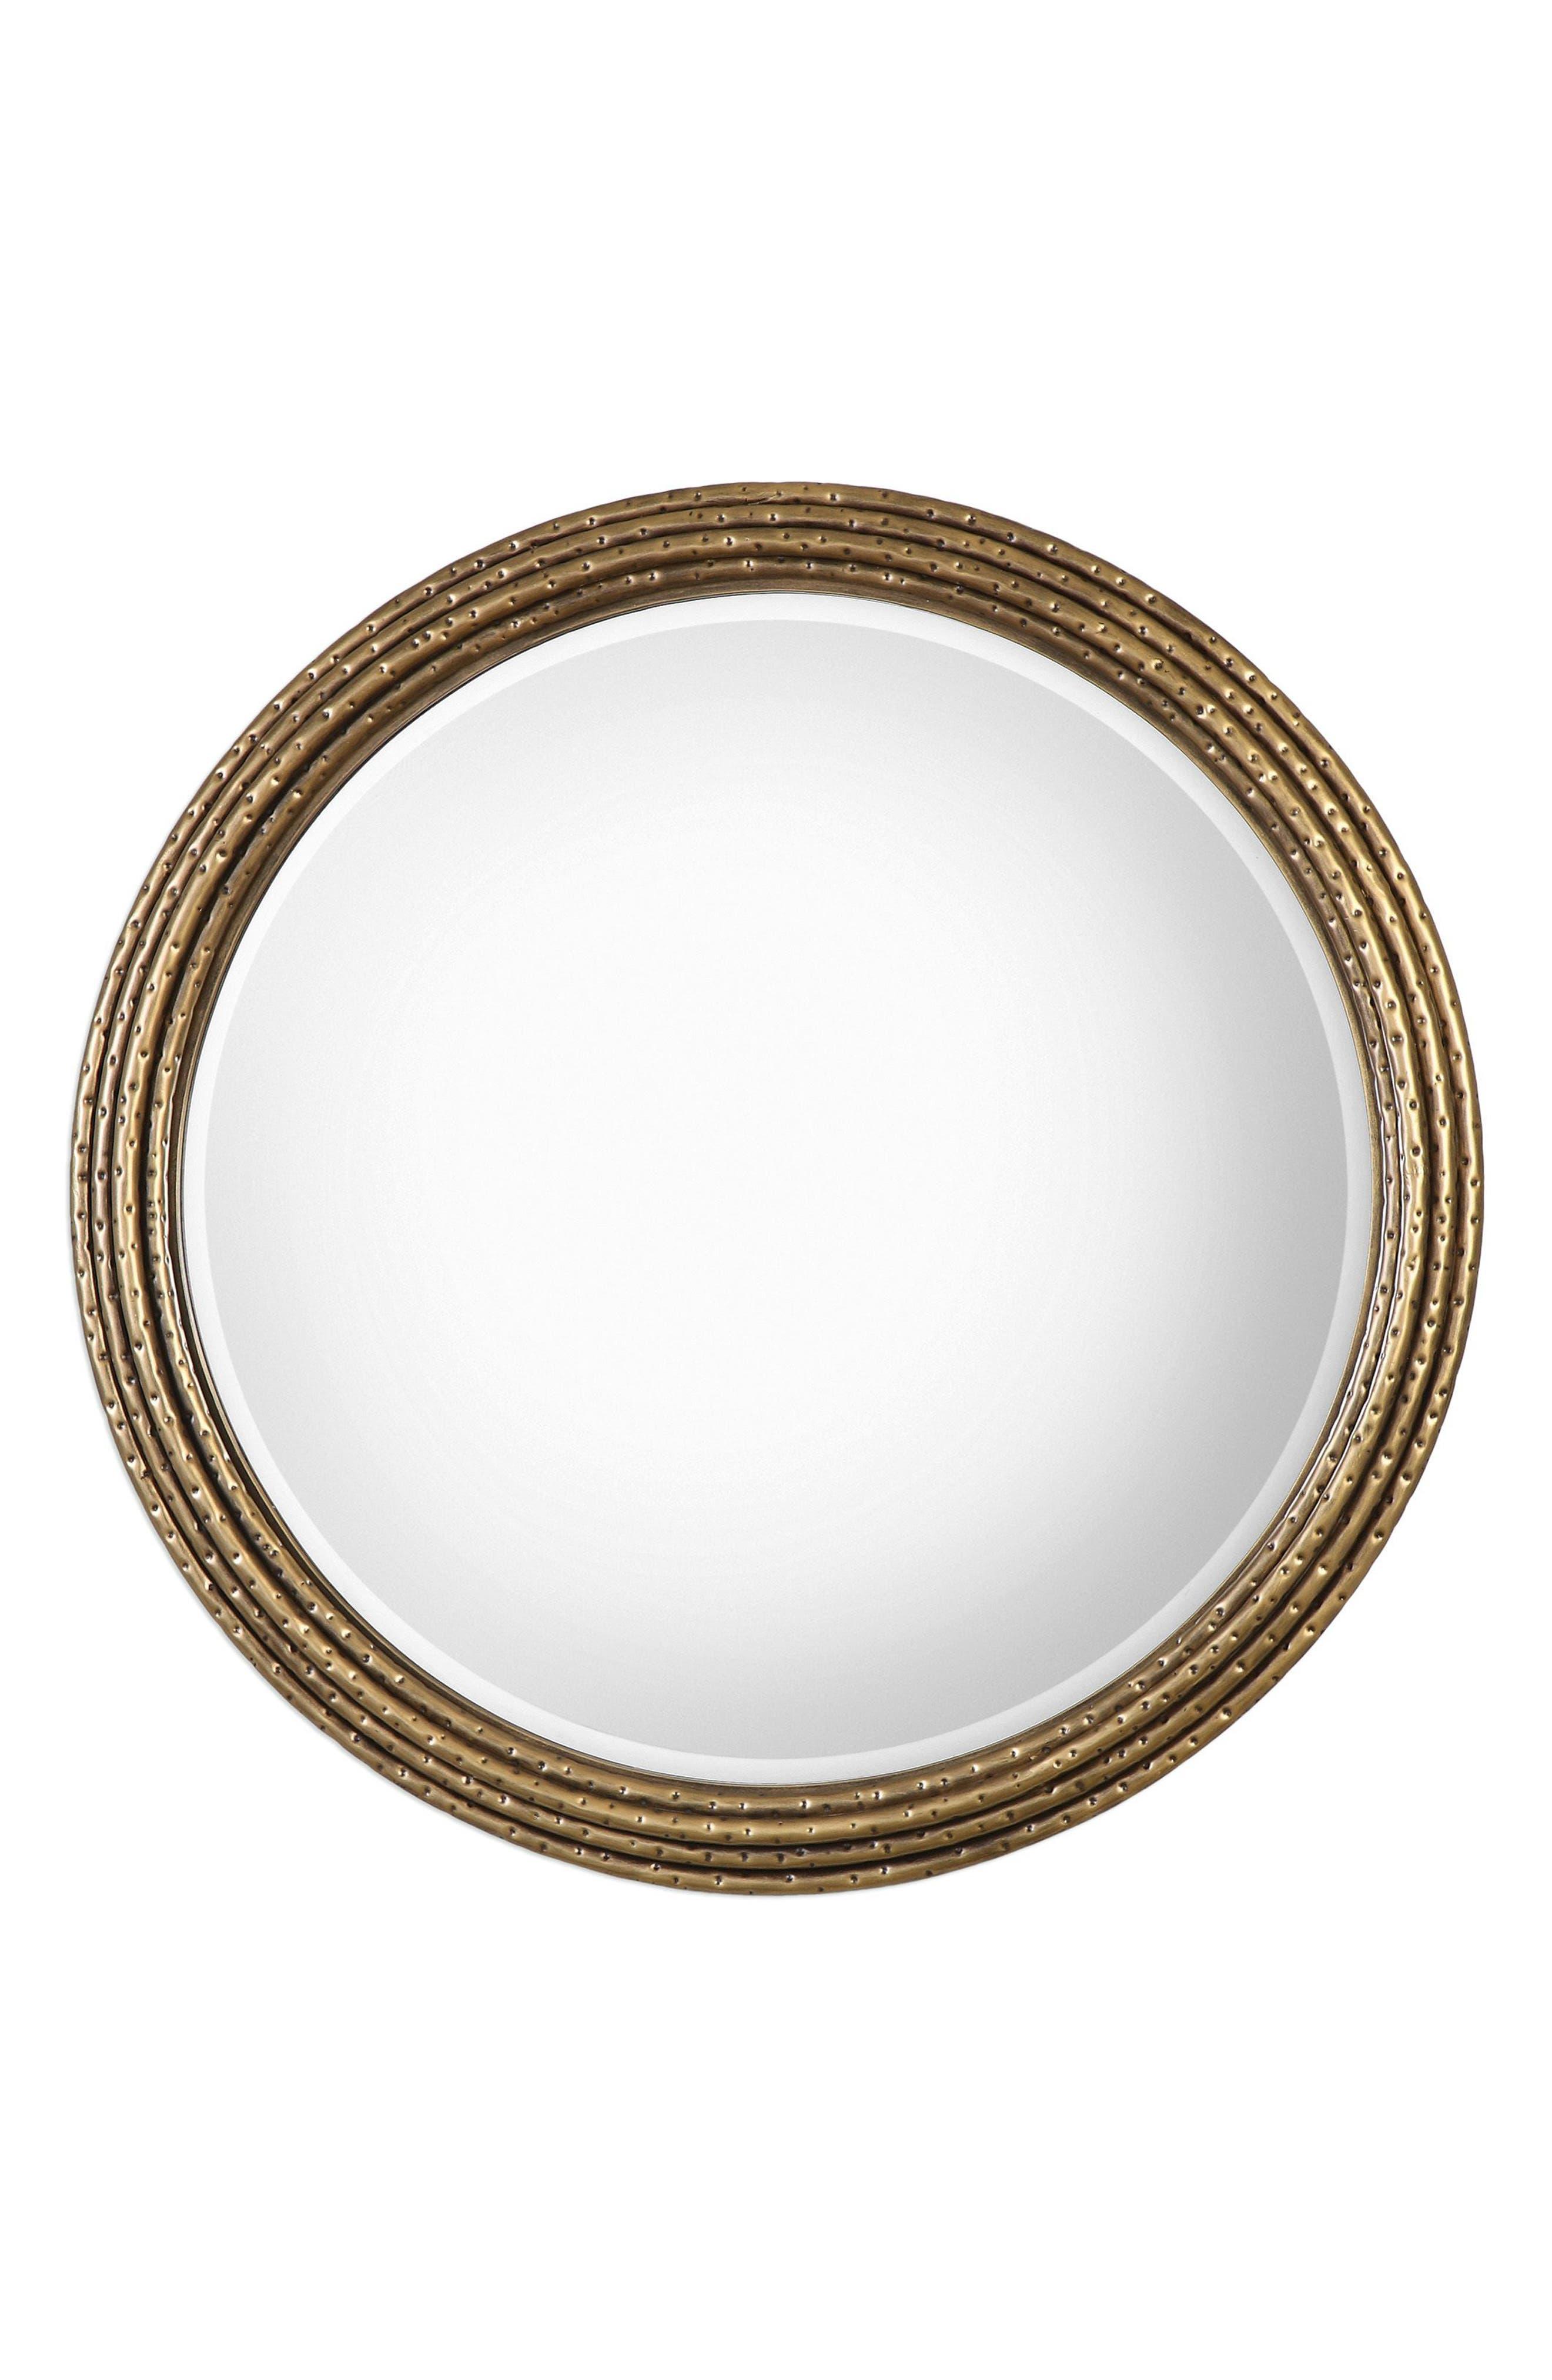 Alternate Image 1 Selected - Uttermost Spera Wall Mirror